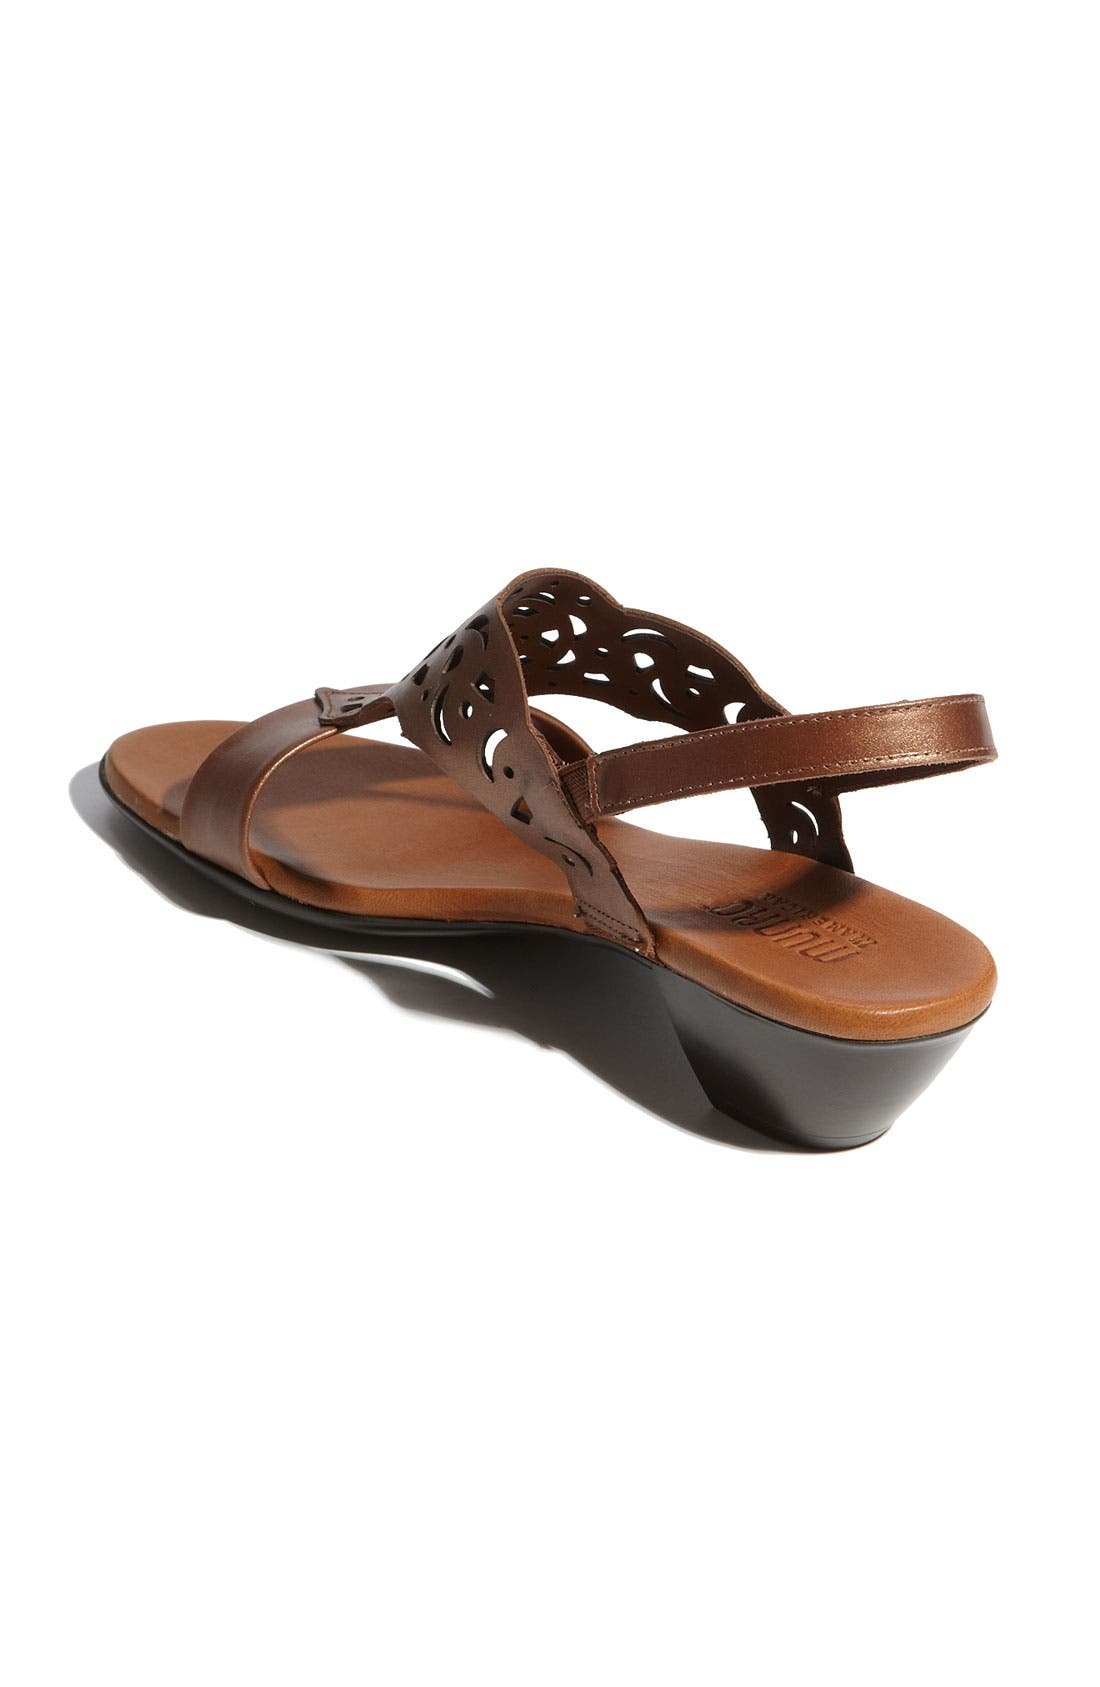 Alternate Image 2  - Munro 'Tahiti' Sandal